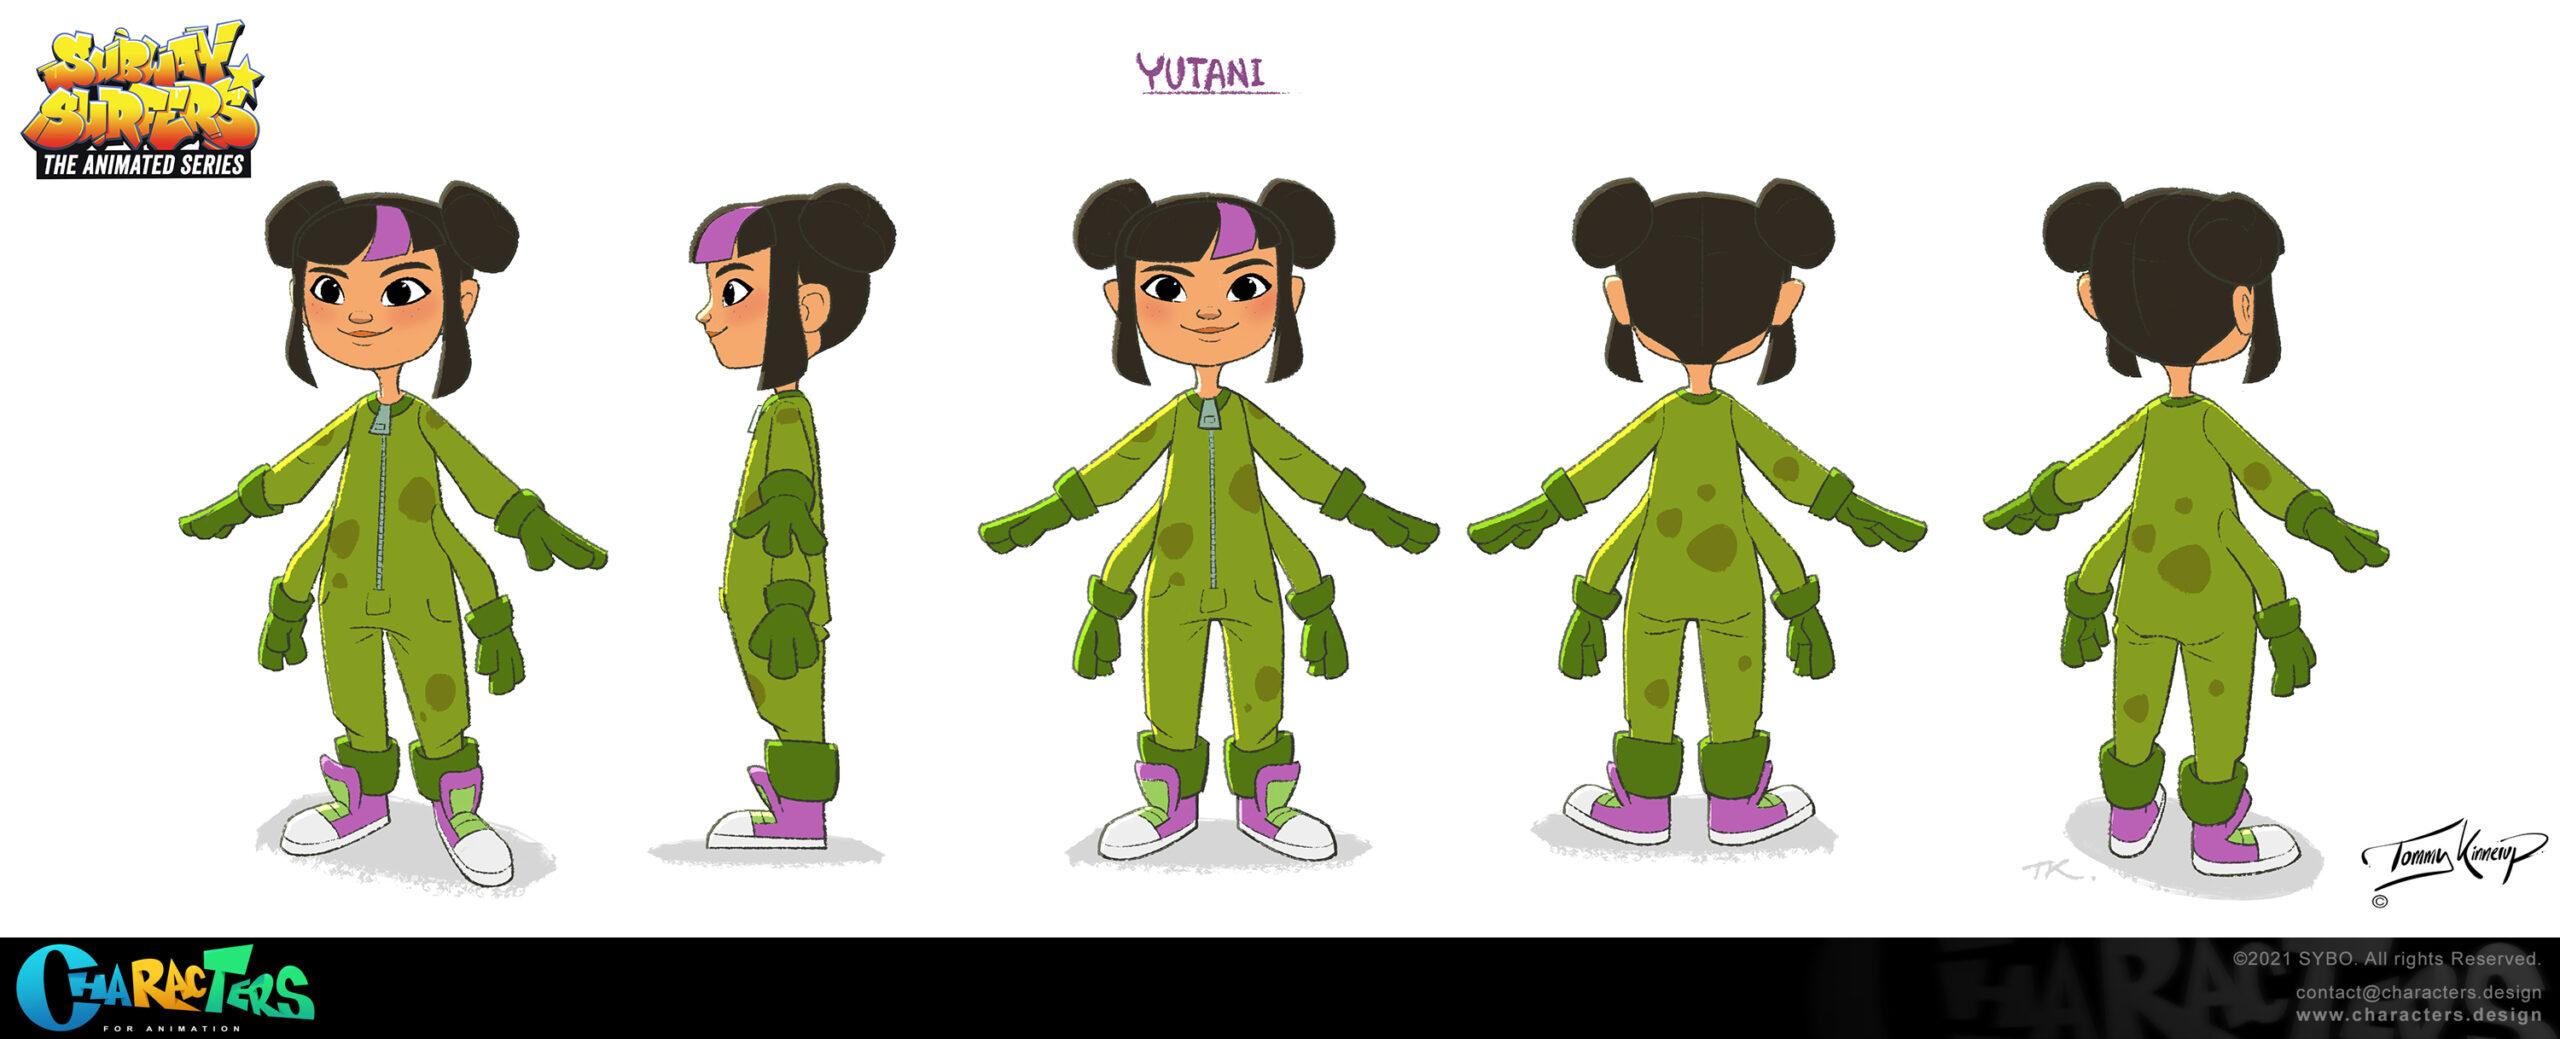 Characters_characterdesign_TK_v08